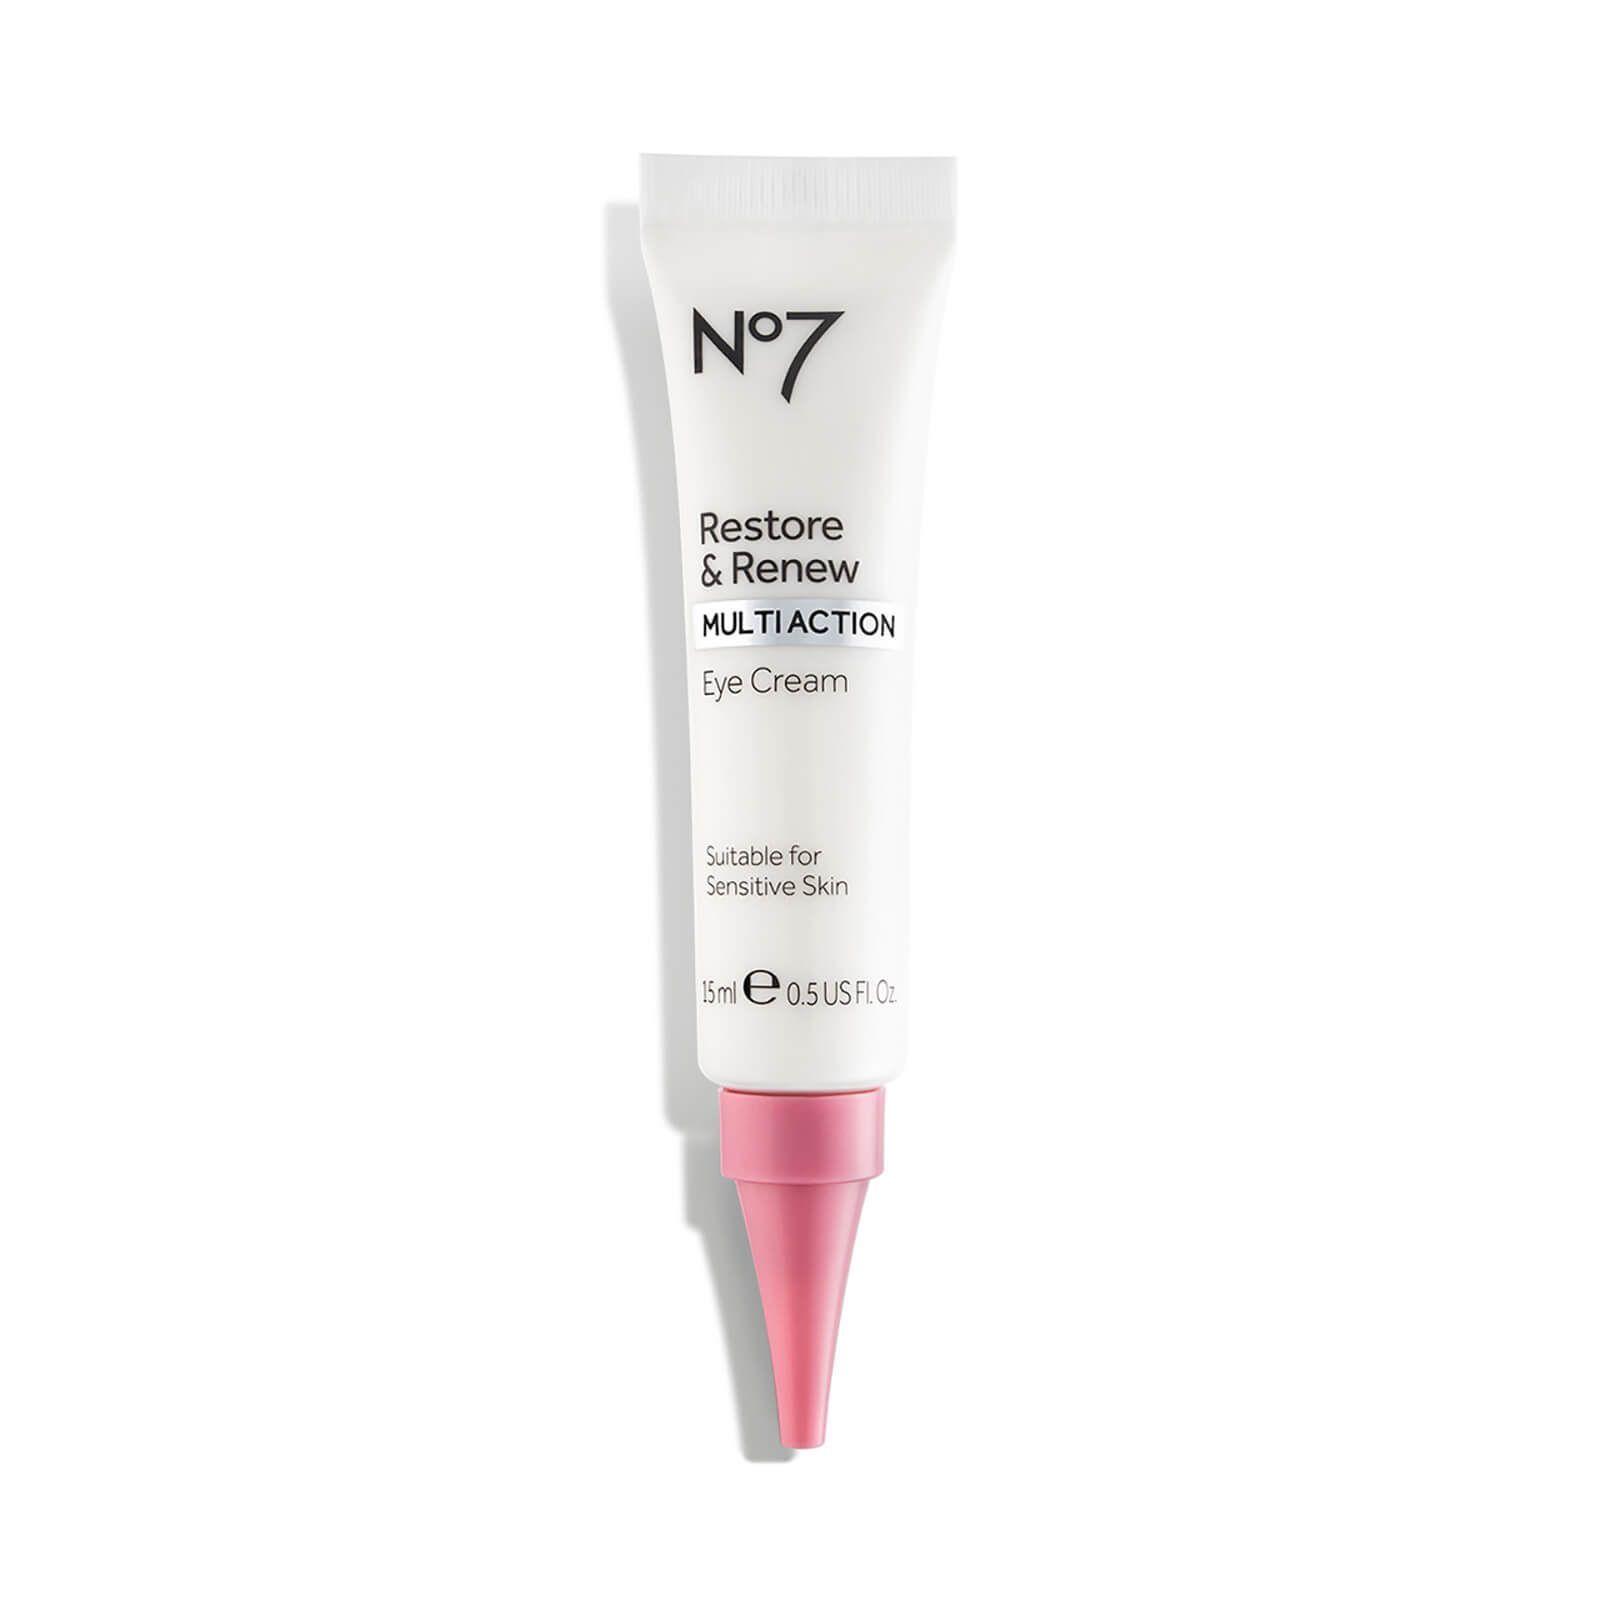 17 Best Eye Creams 2020 Top Eye Creams For Wrinkles Bags Puffiness